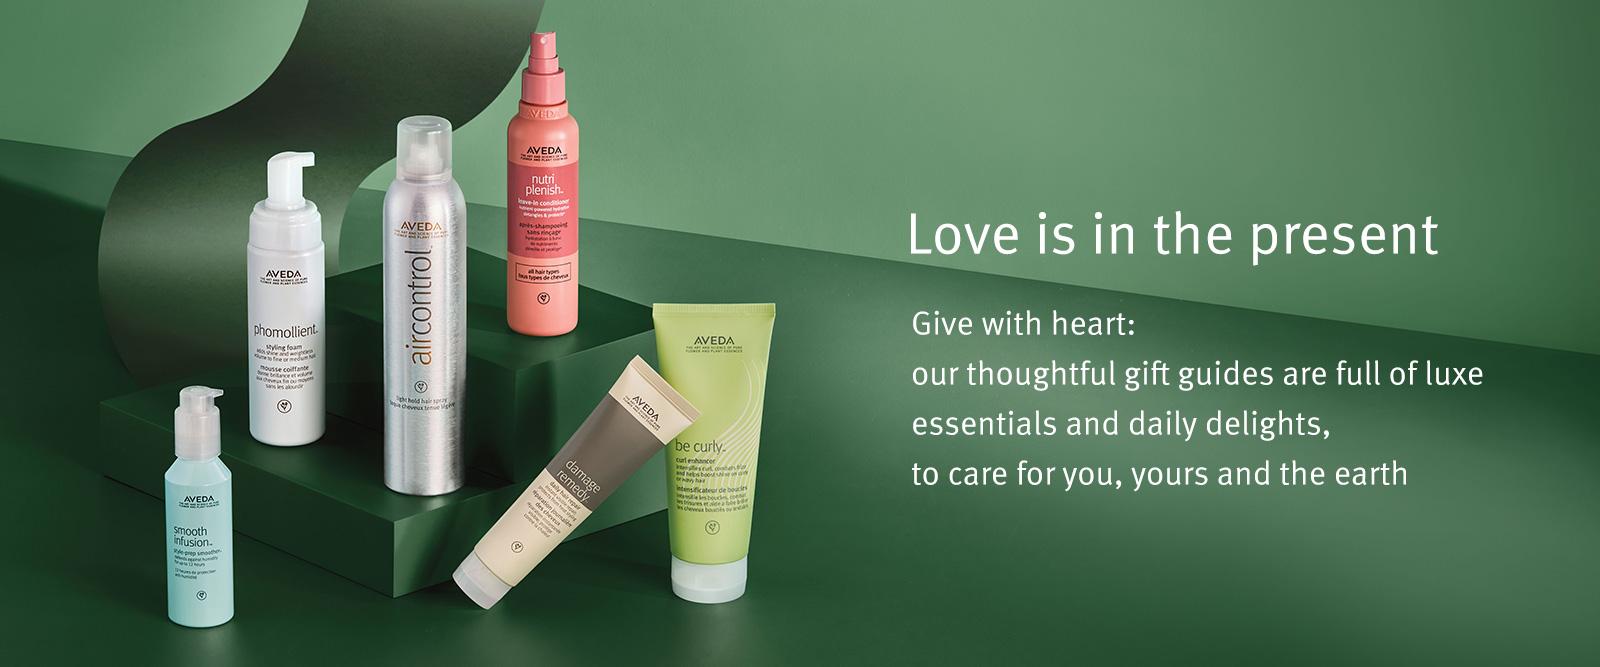 Love-gifts_Avalon-SalonSpa